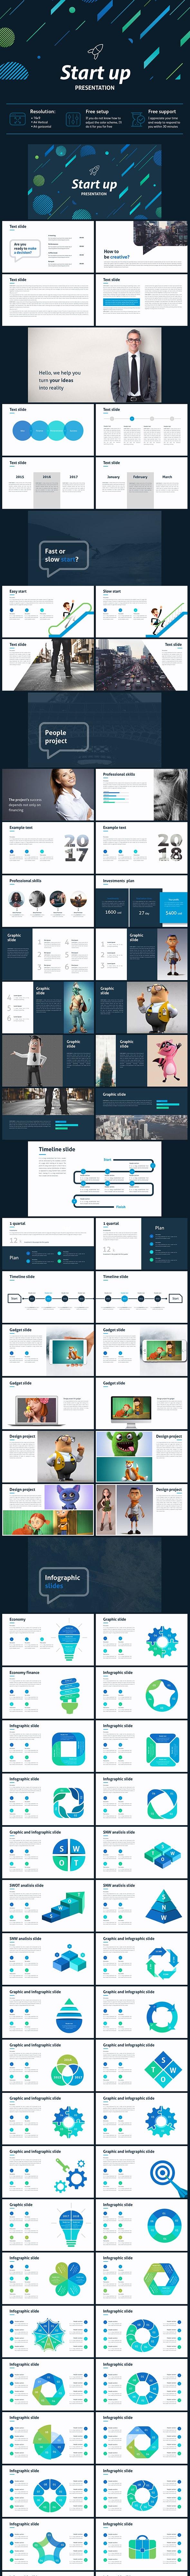 Start up Powerpoint Template - Business PowerPoint Templates